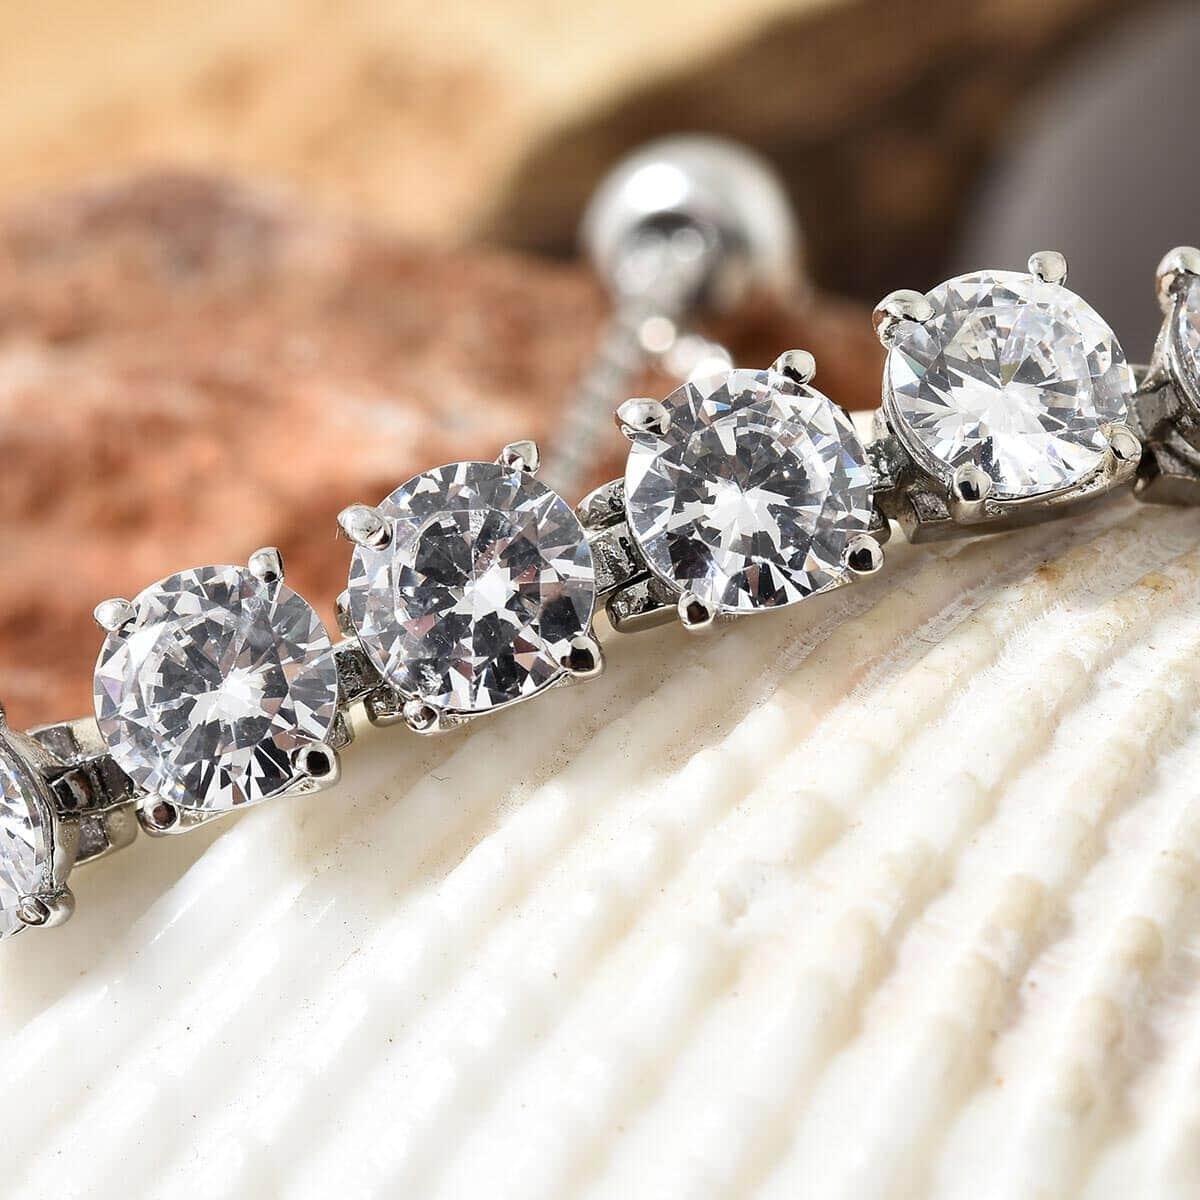 Steel-Cubic-Zirconia-CZ-Orange-Elegant-Adjustable-Bolo-Bracelet-for-Women-Ct-21 thumbnail 30